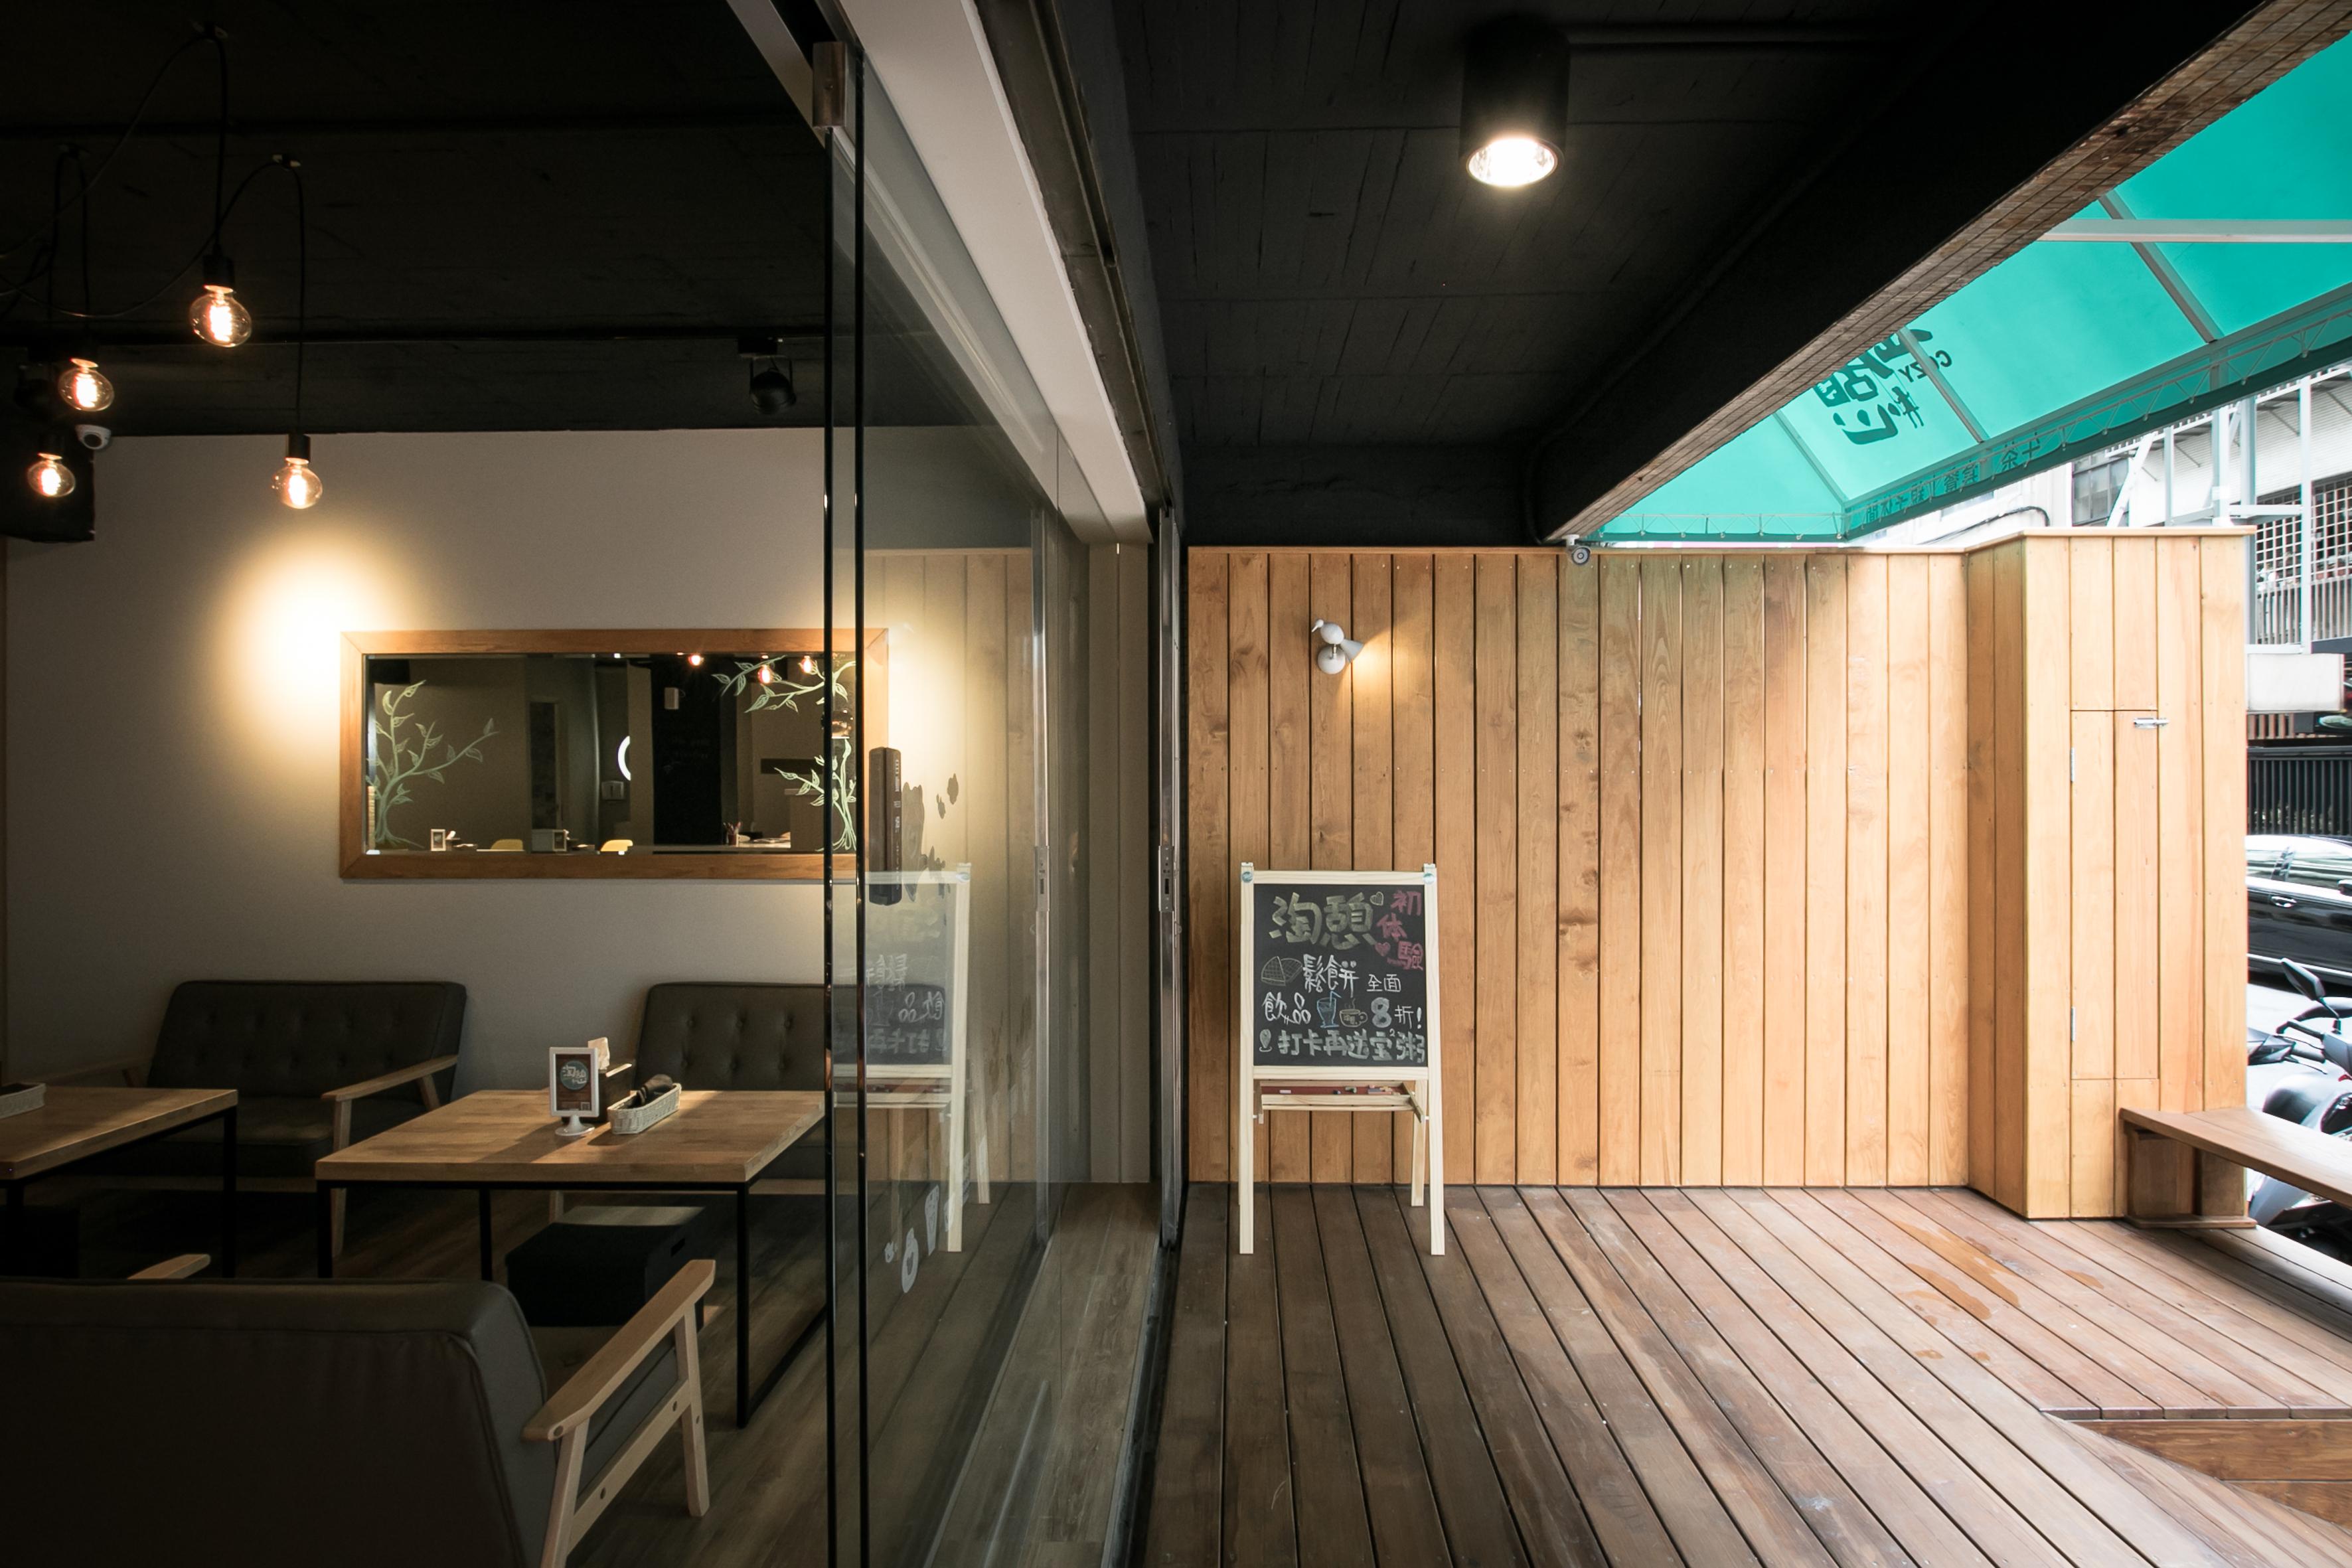 cozy-style 親子餐廳設計 (10)